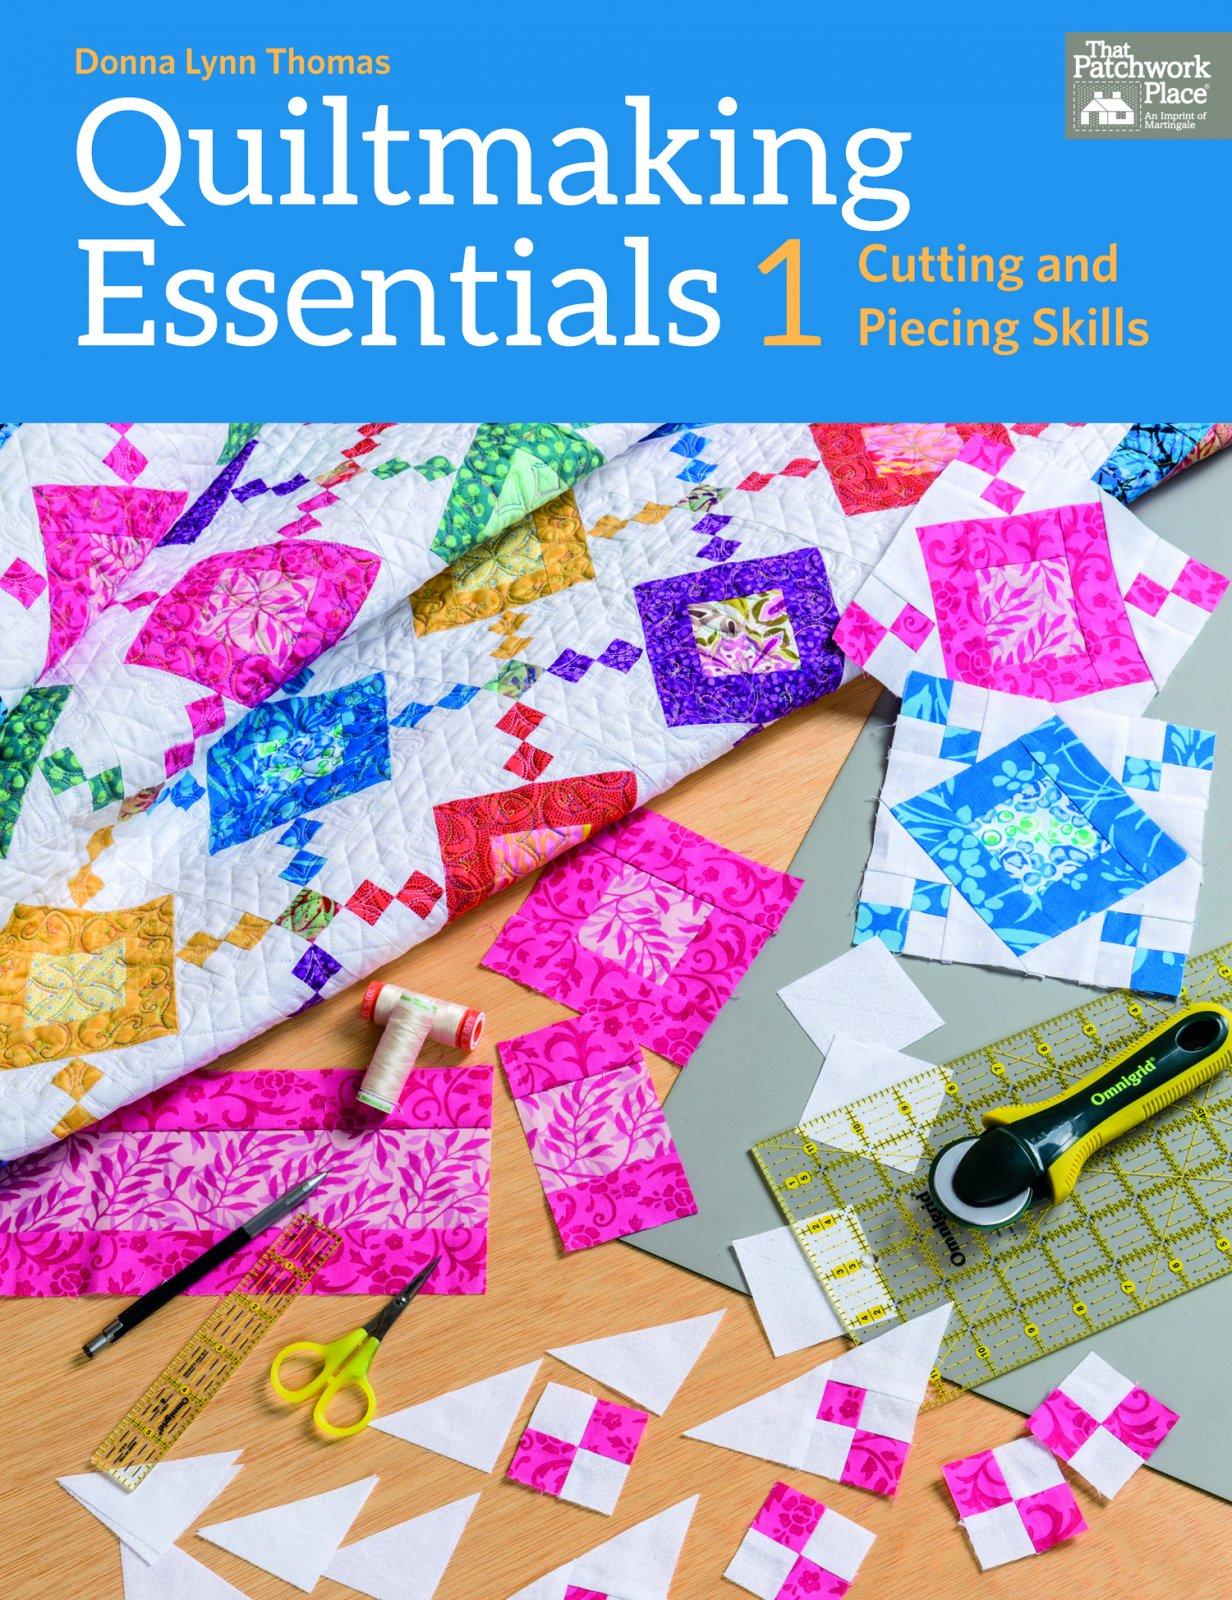 Quilting Making Essentials 1